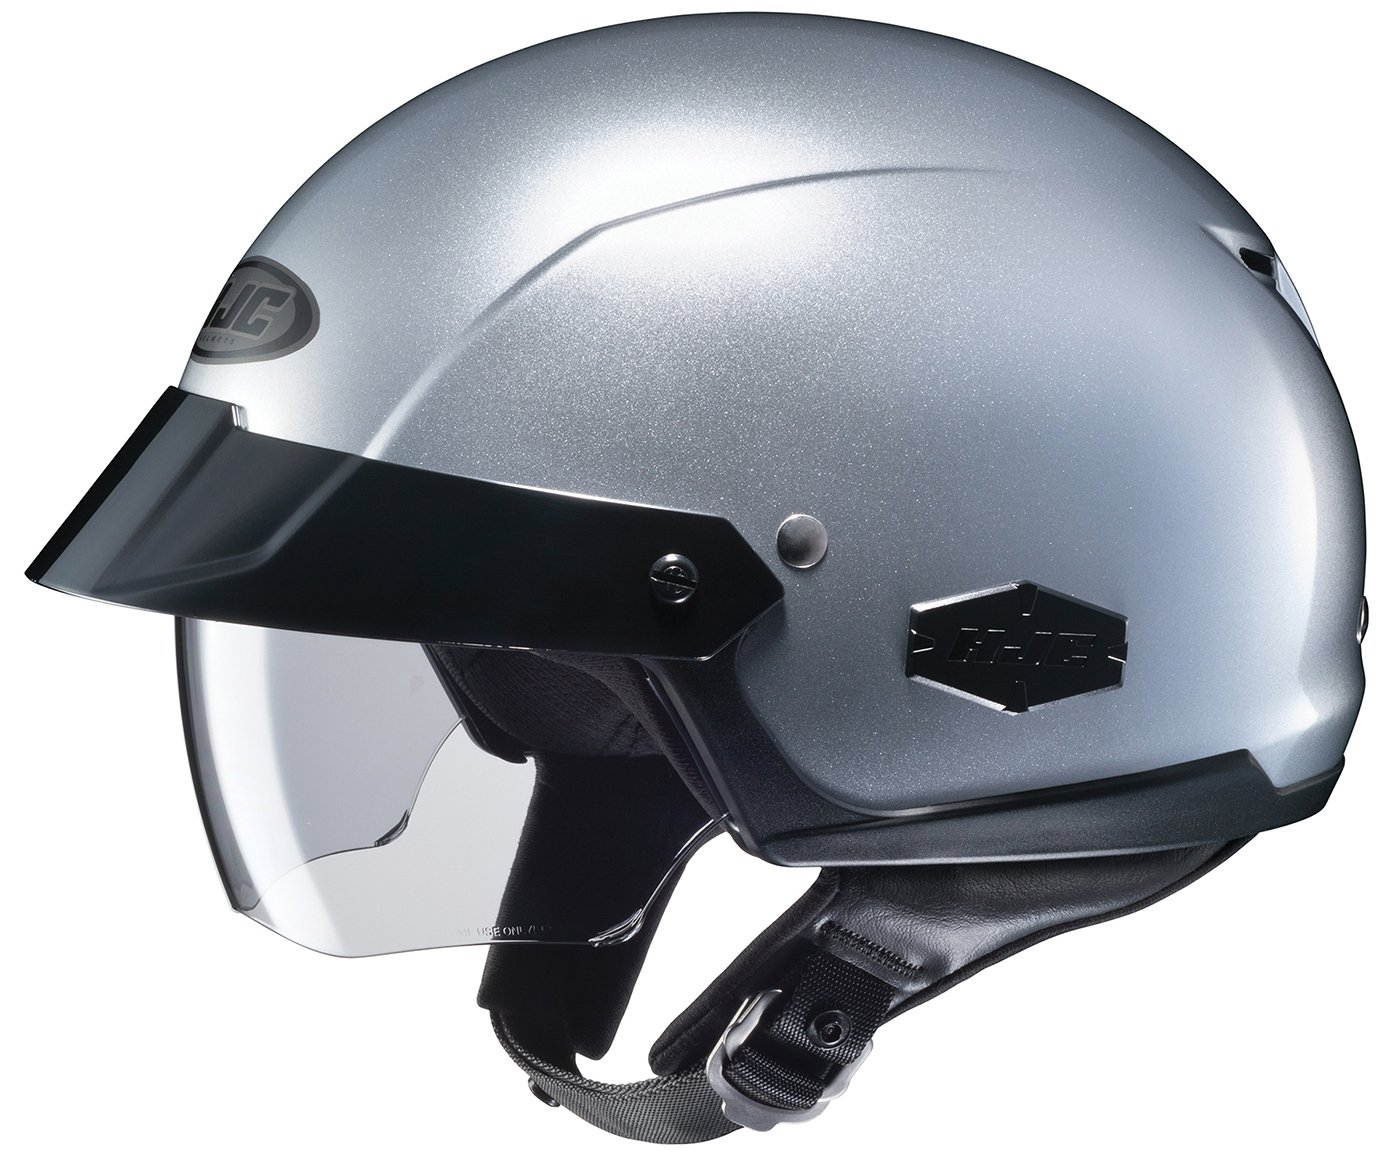 HJC IS-Cruiser Half-Shell Motorcycle Riding Helmet (Silver, X-Small)